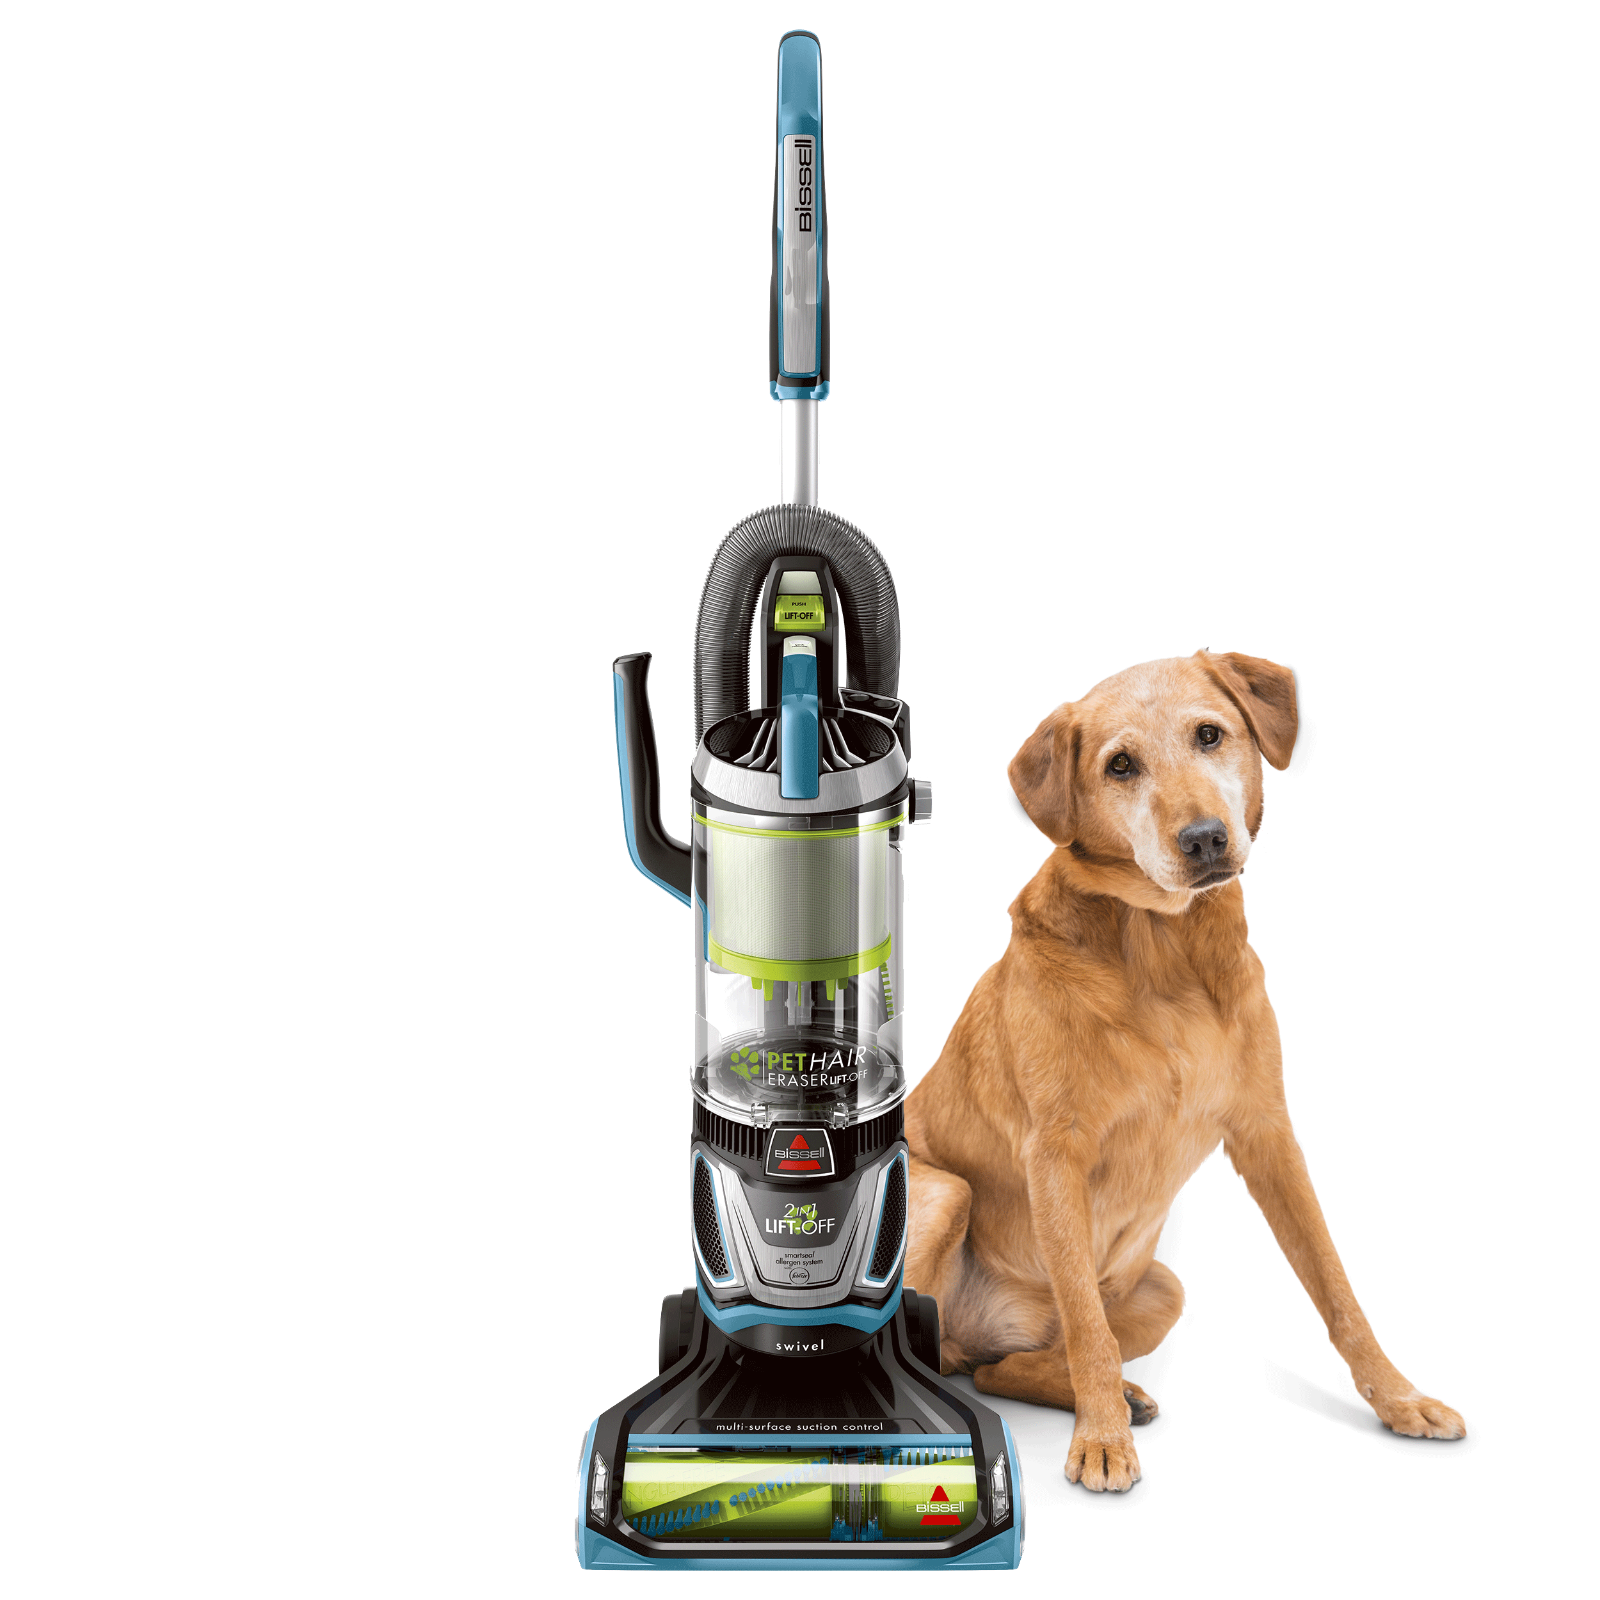 BISSELL 2087 Pet Hair Eraser Lift-off Bagless Upright Vacuum